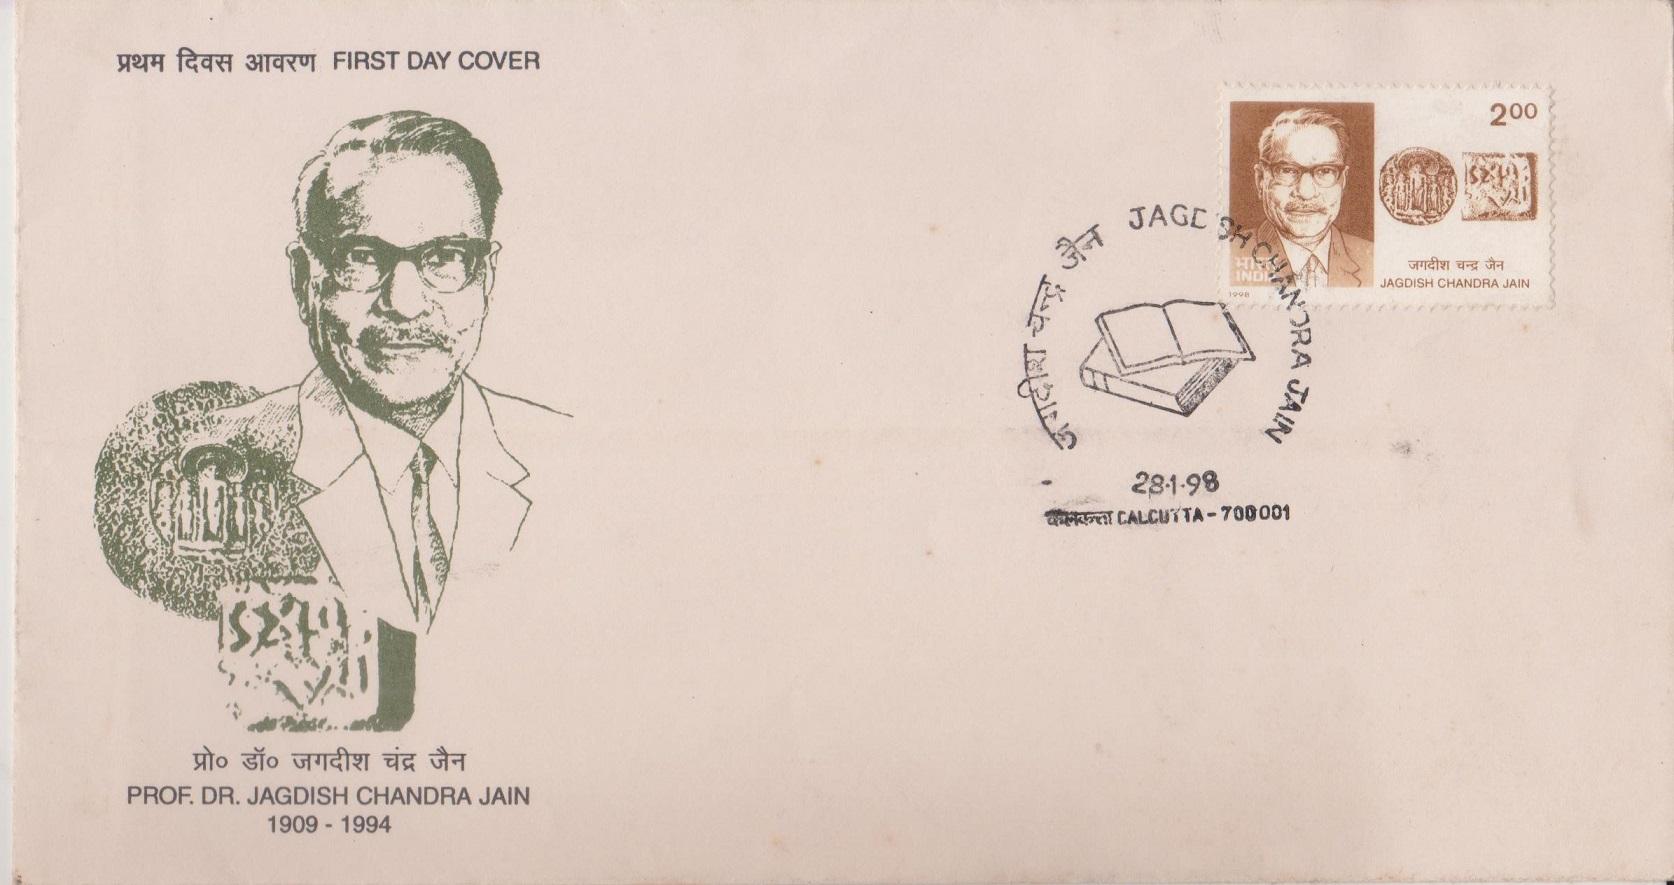 डॉ जगदीश चन्द्र जैन, chief witness in Gandhi's murder trial